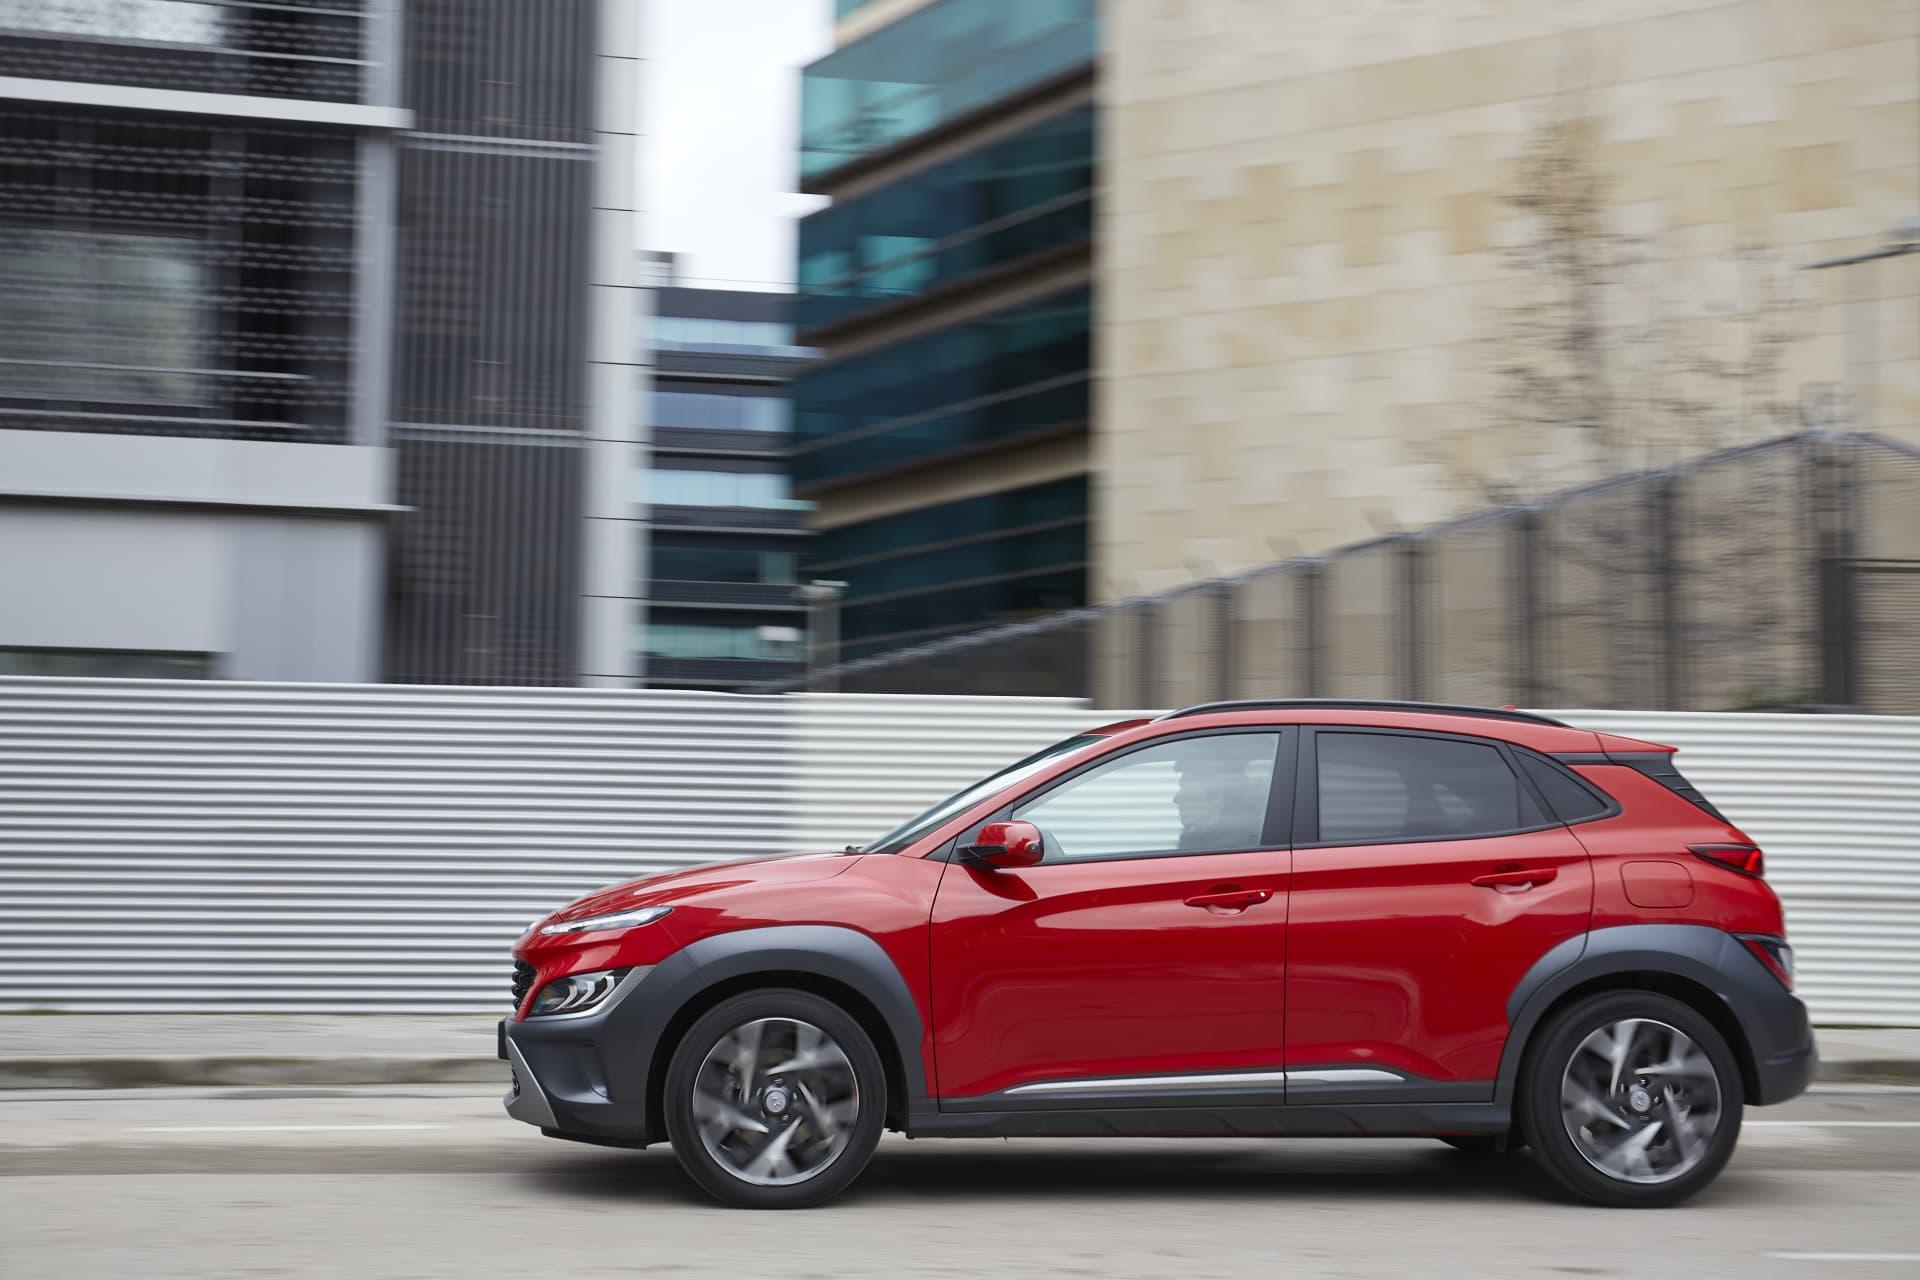 Hyundai Kona Hibrido Hev 2021 Prueba Analisis 8